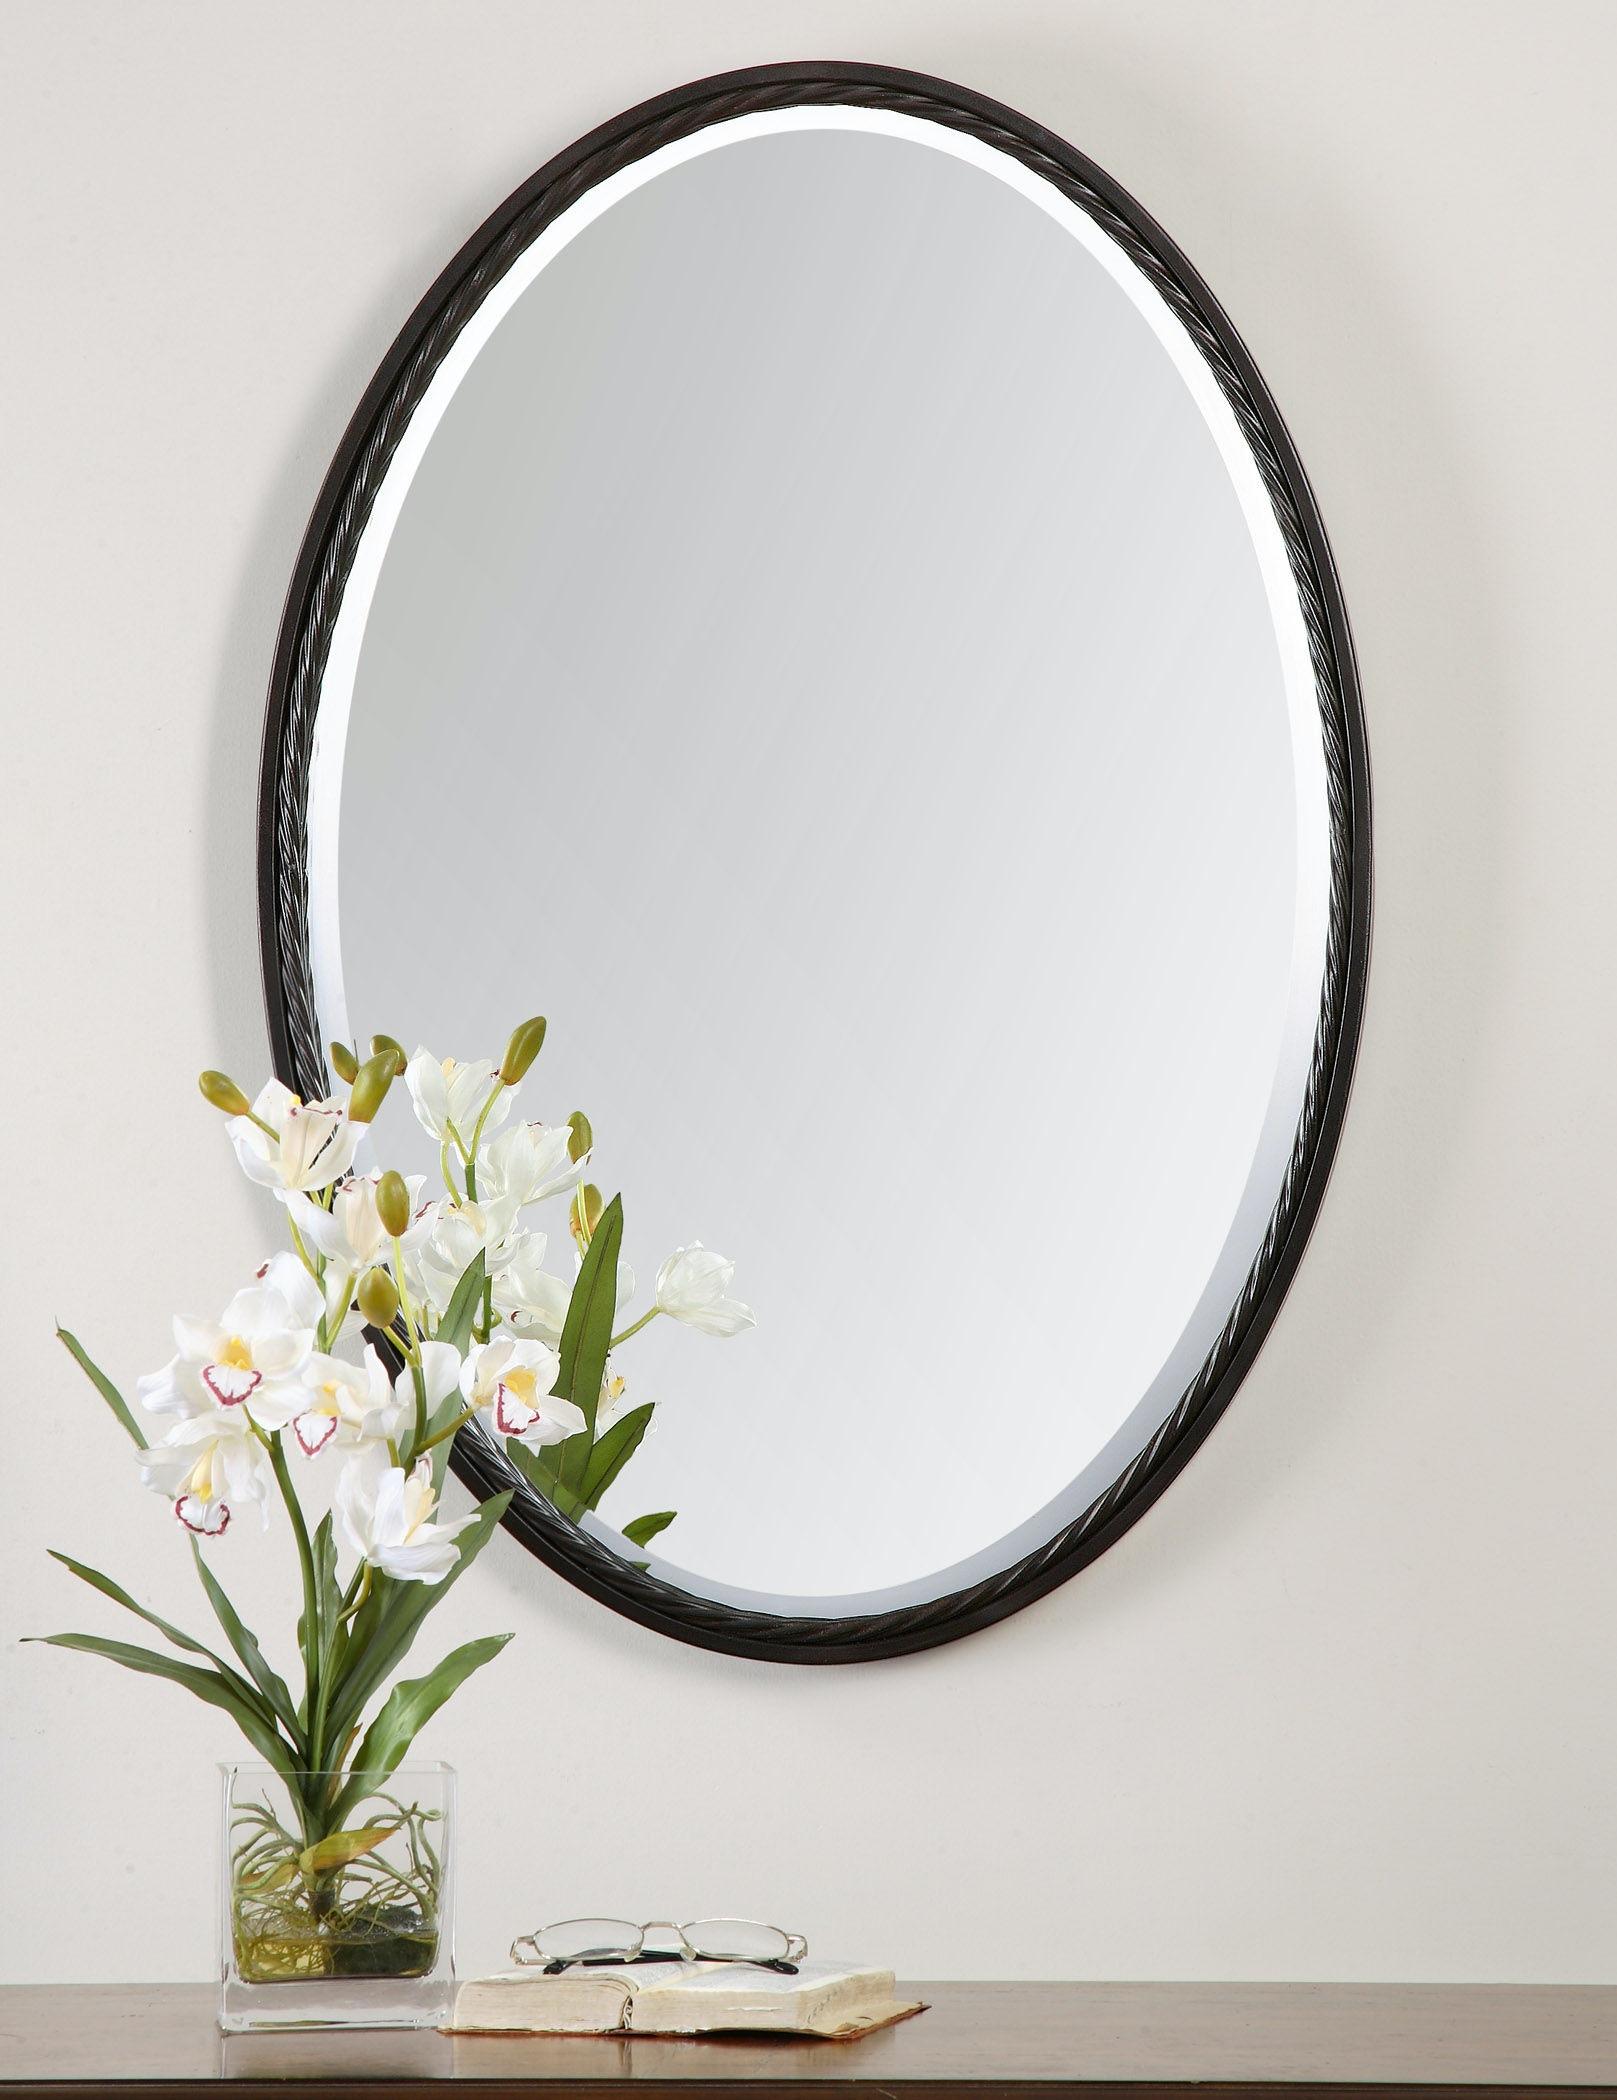 Uttermost Bedroom Casalina Oil Rubbed Bronze Oval Mirror 01116